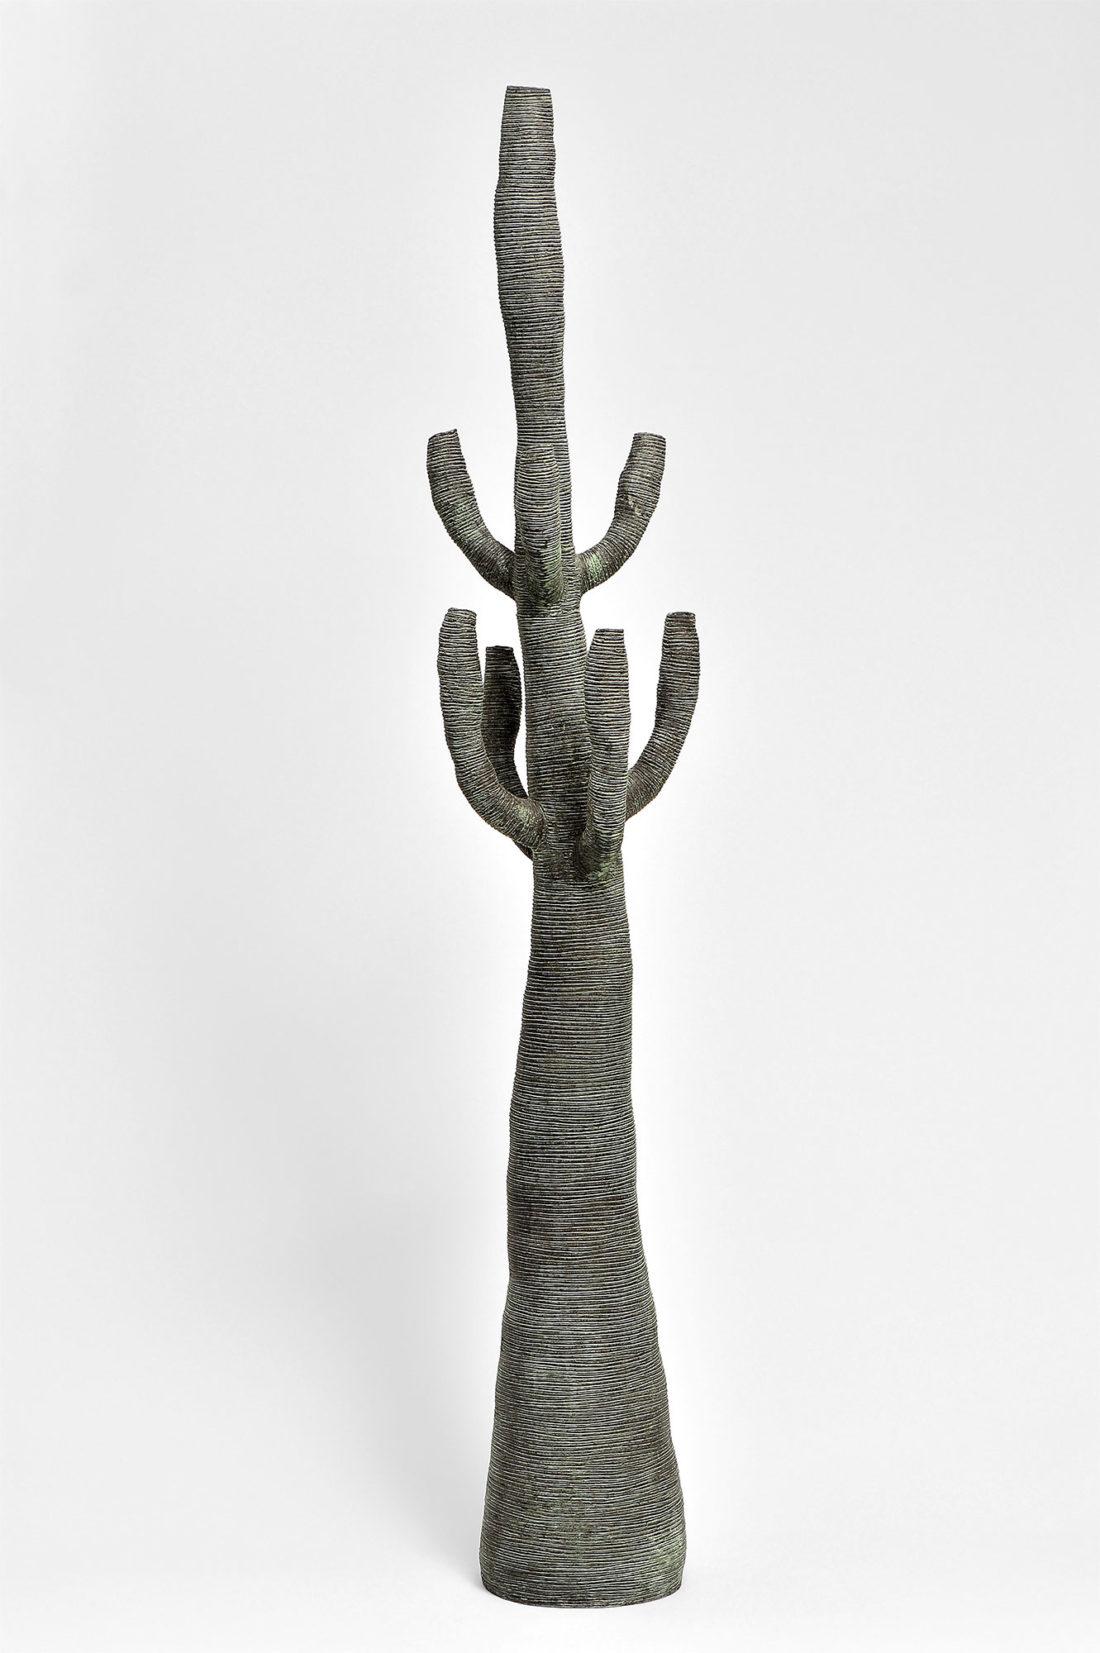 Grès, H 150cm